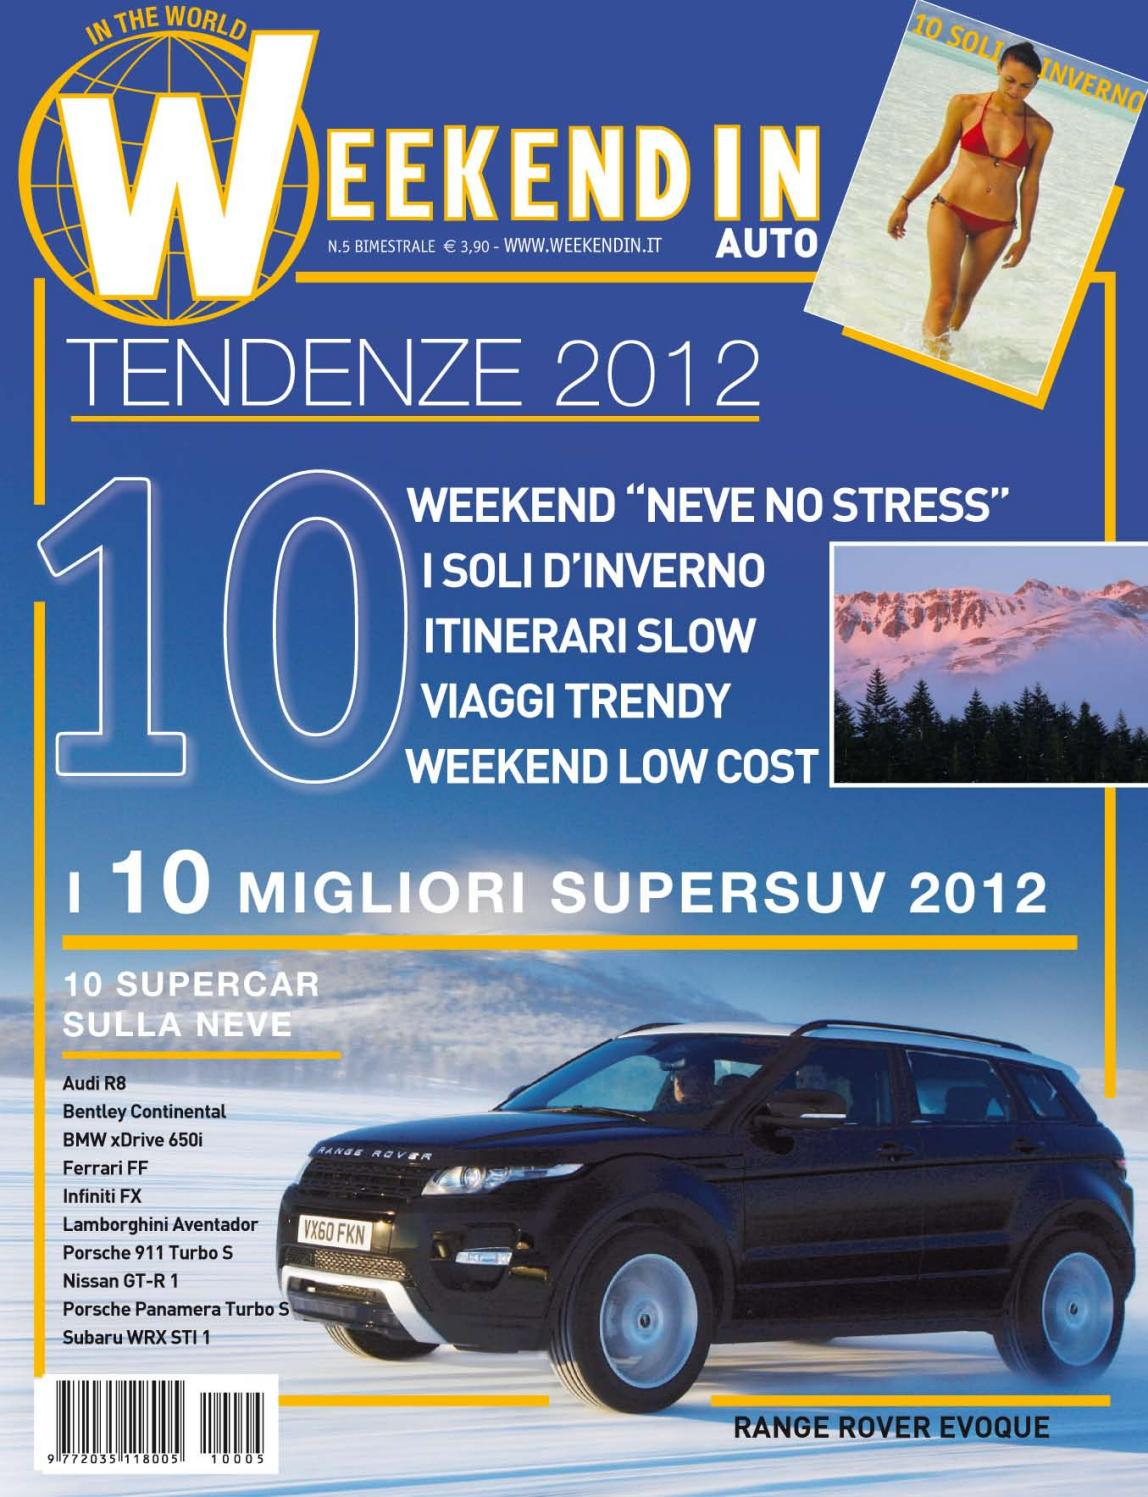 DISCO FRENO CARBON CERAMICA Conversione BMW i8 AUDI R8 FERRARI 360 430 LAMBORGHINI